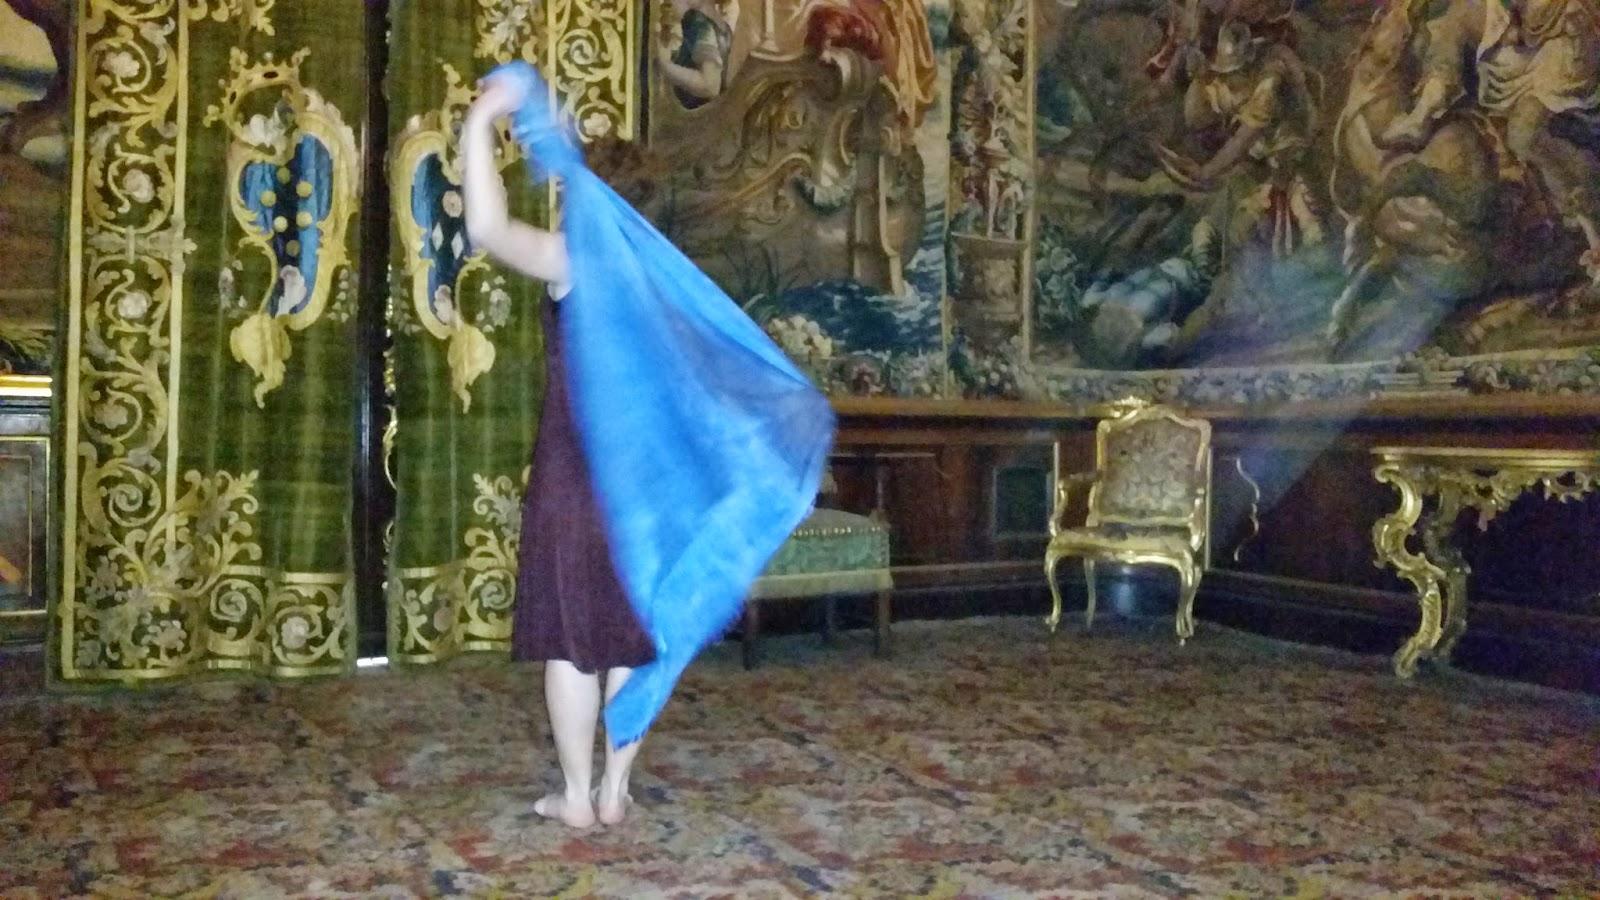 http://www.passaparolablog.com/2015/03/dance-meeting-lucca-danza-al-museo-14.html